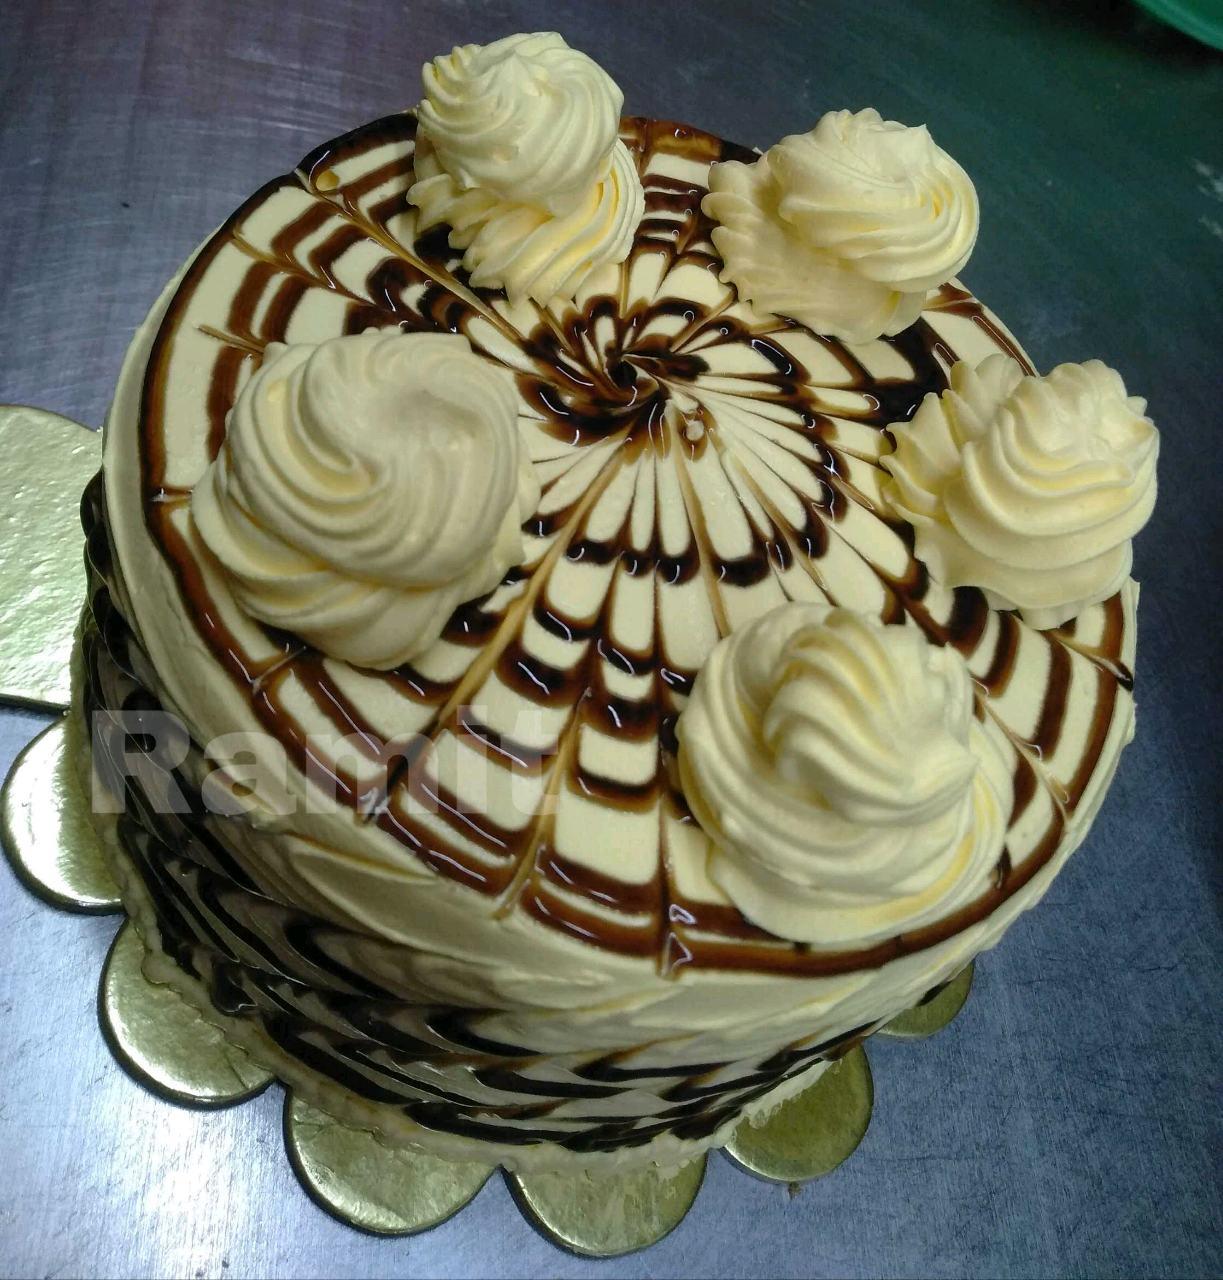 Choco Peanut Butter Cake